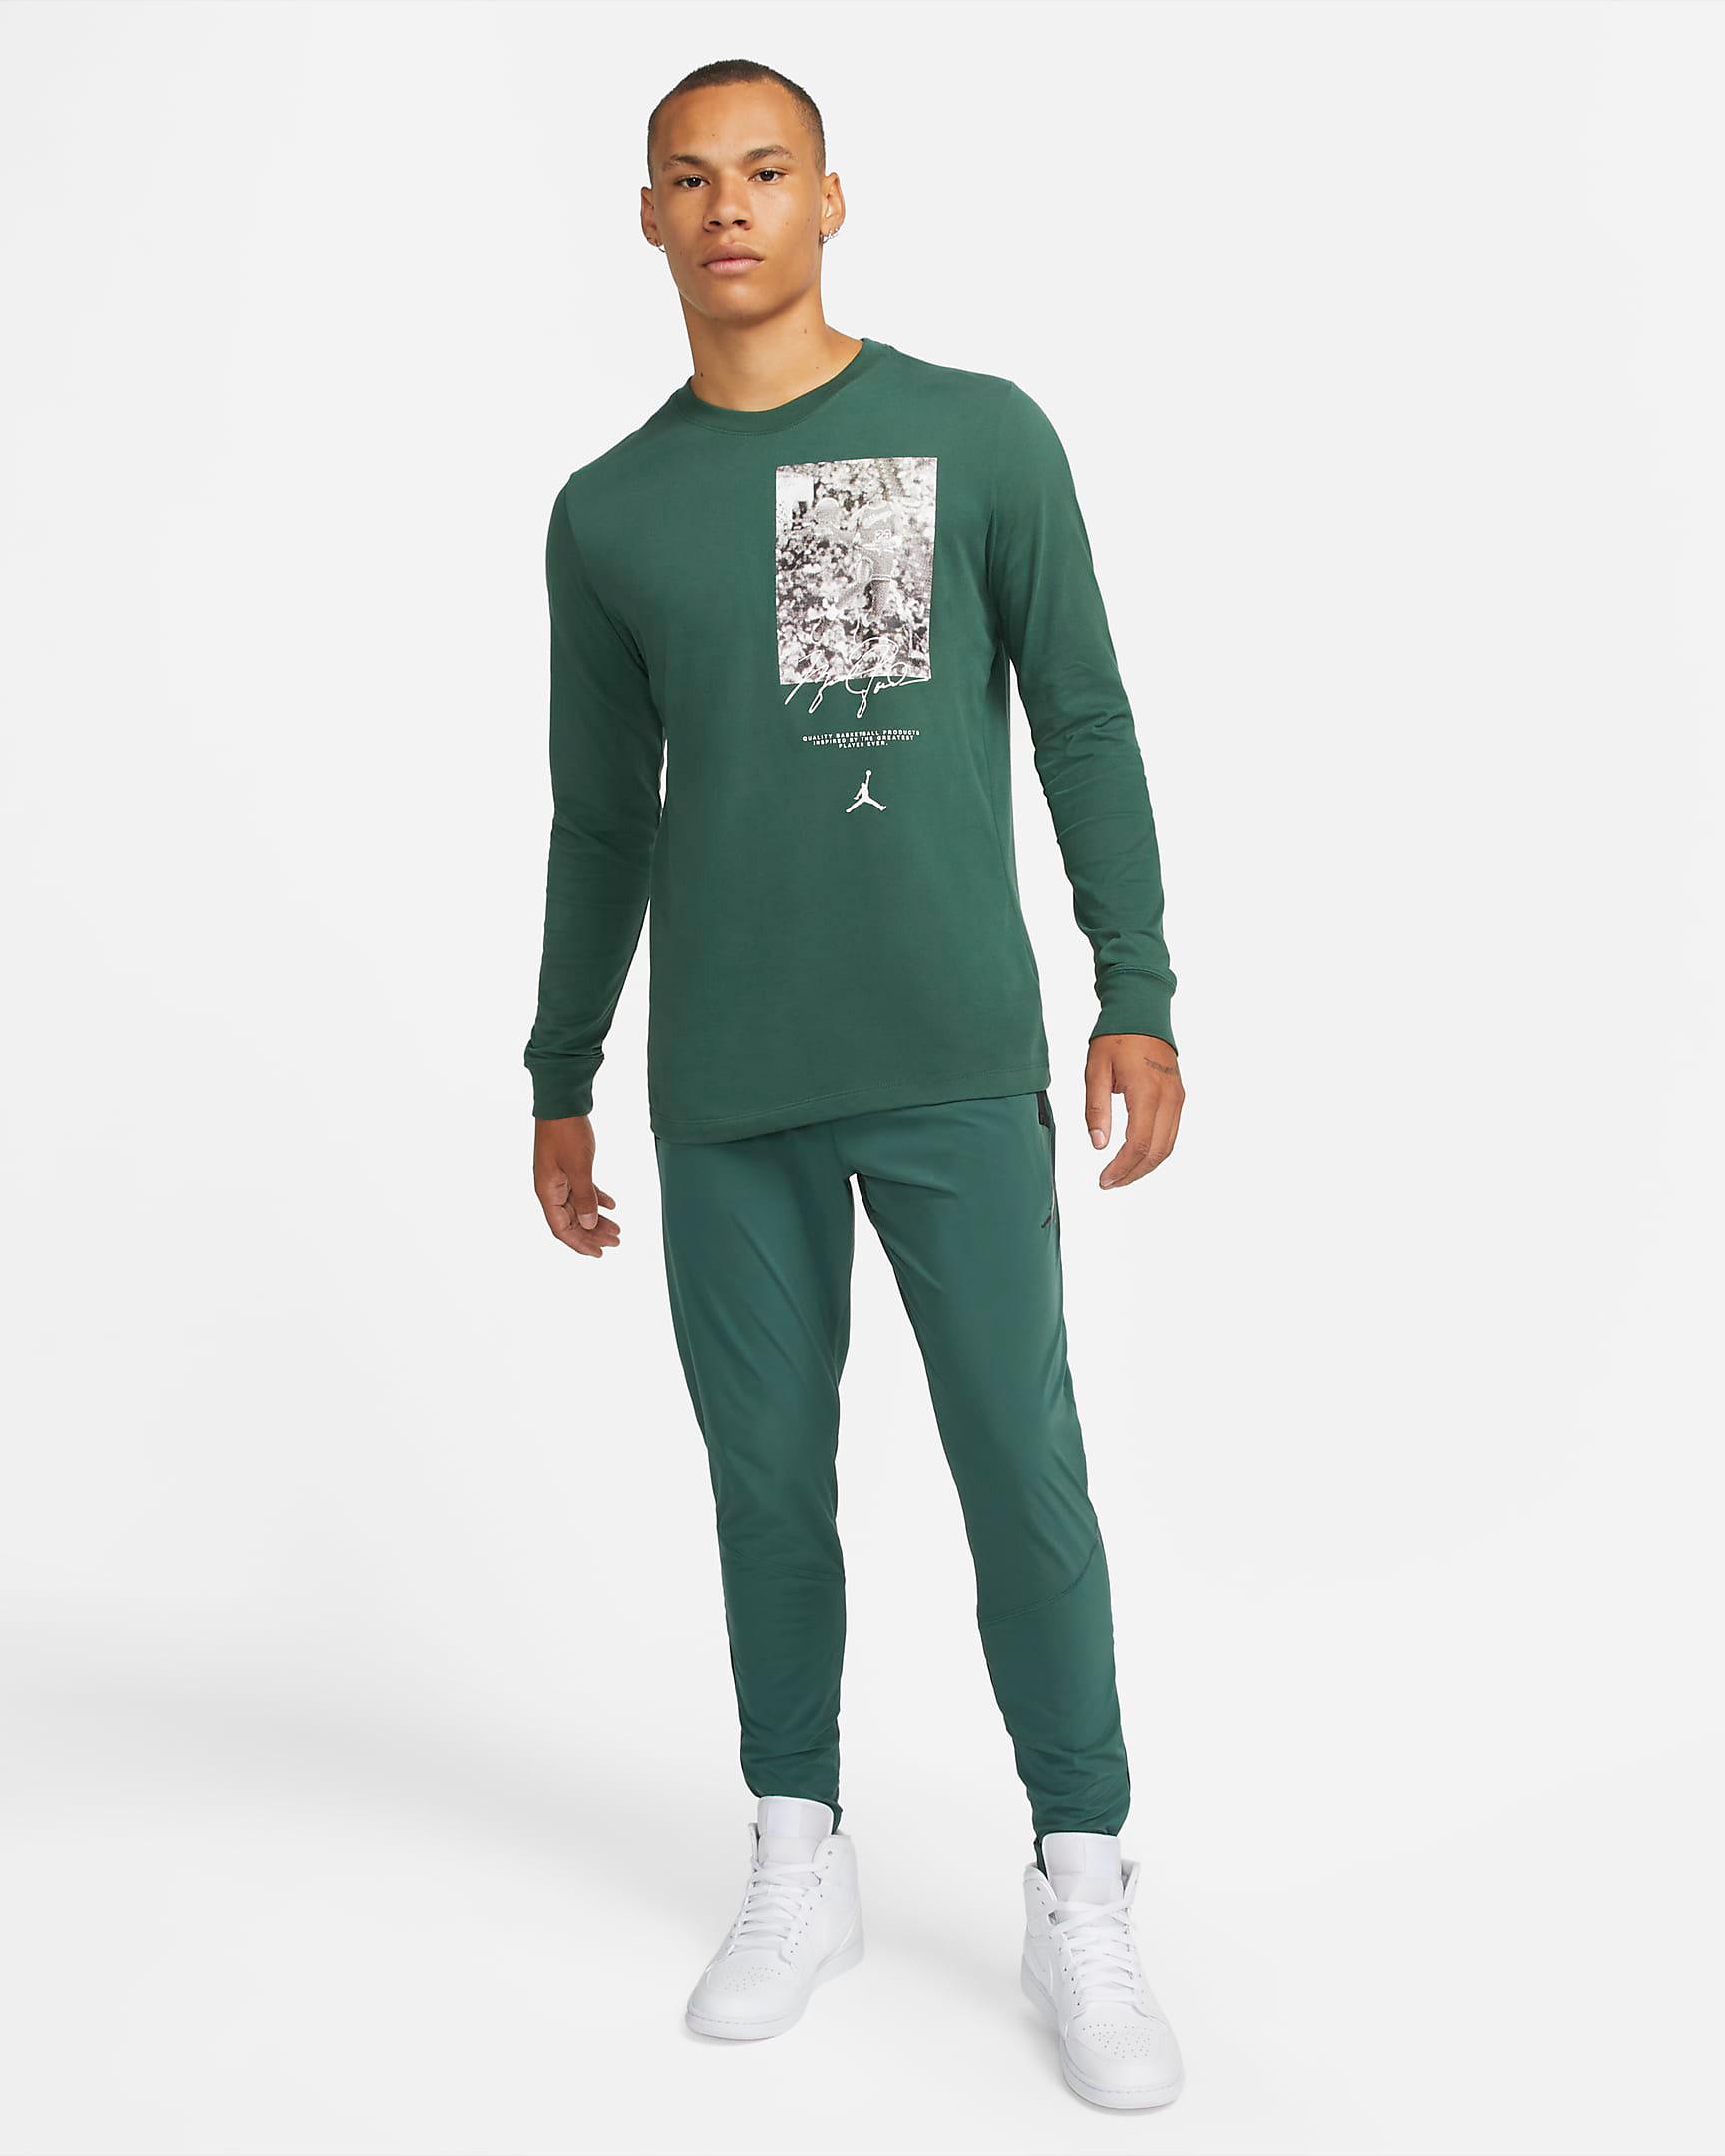 jordan-noble-green-air-statetment-pants-shirt-outfit